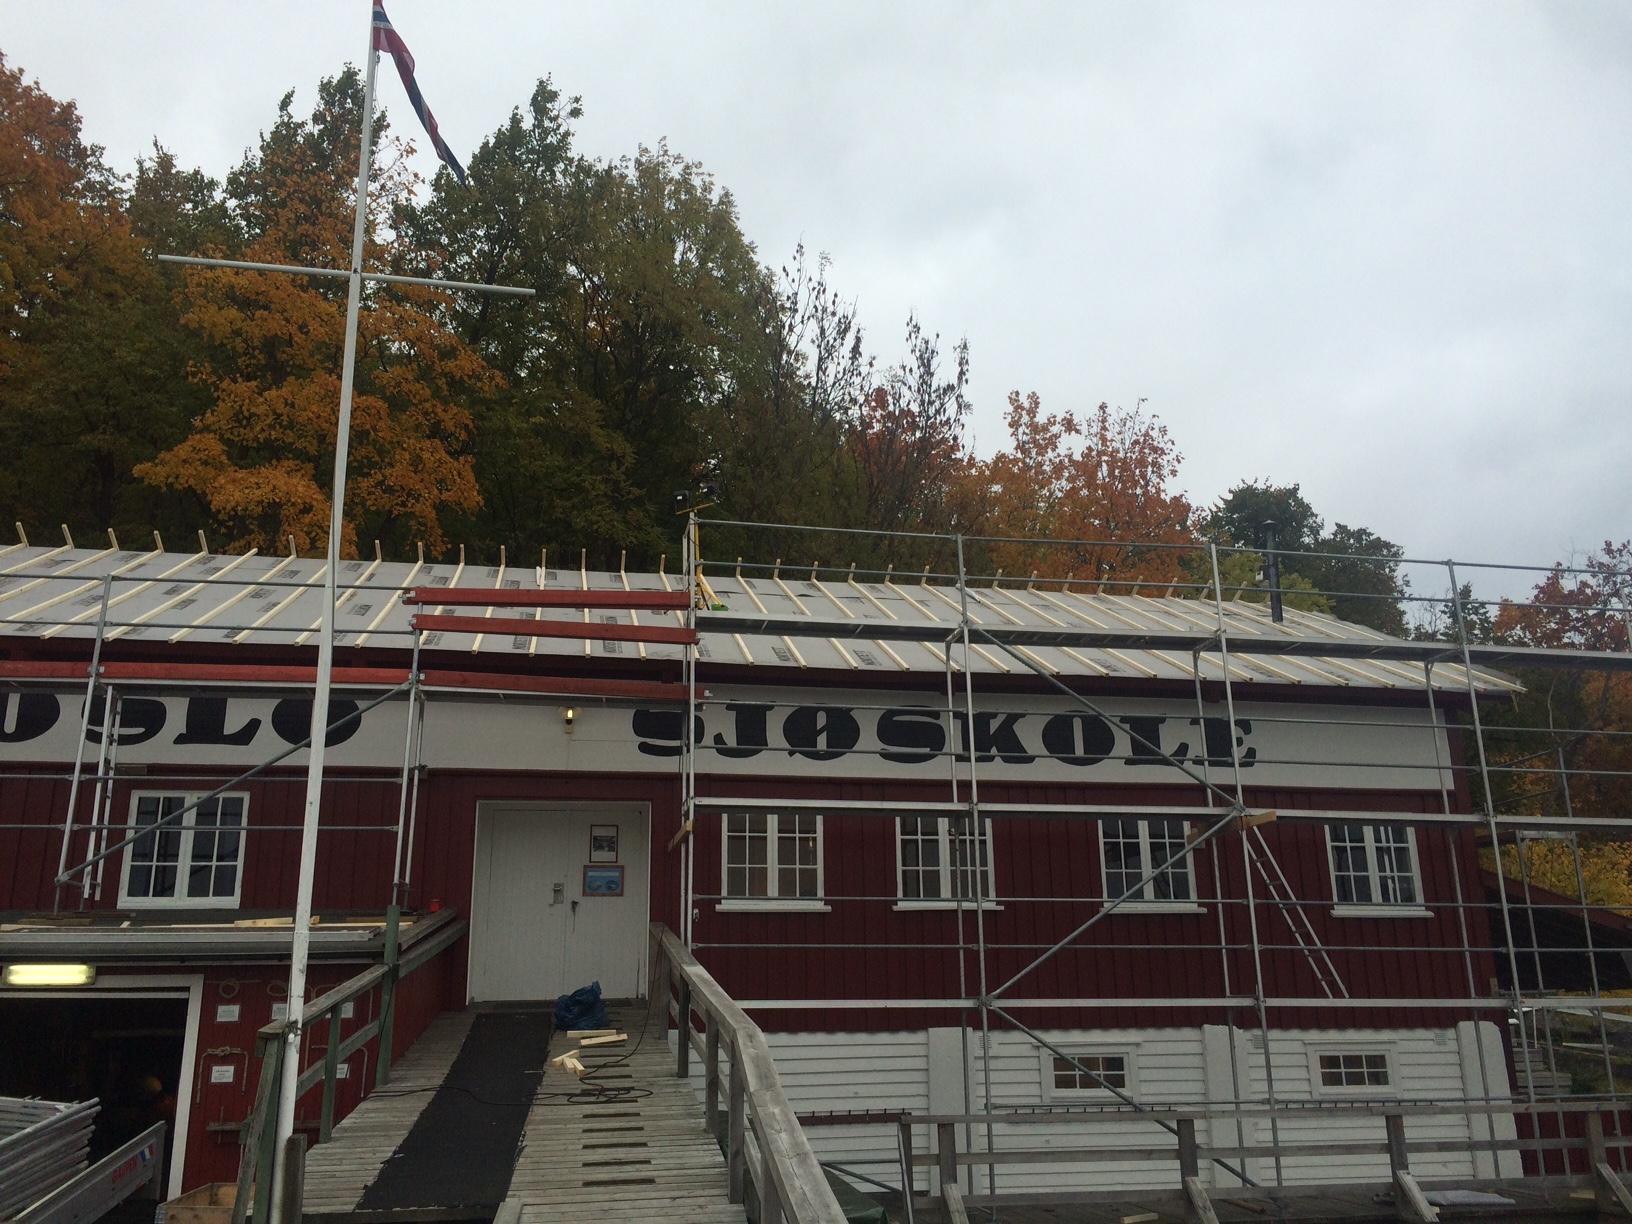 Oslo Sjøskole